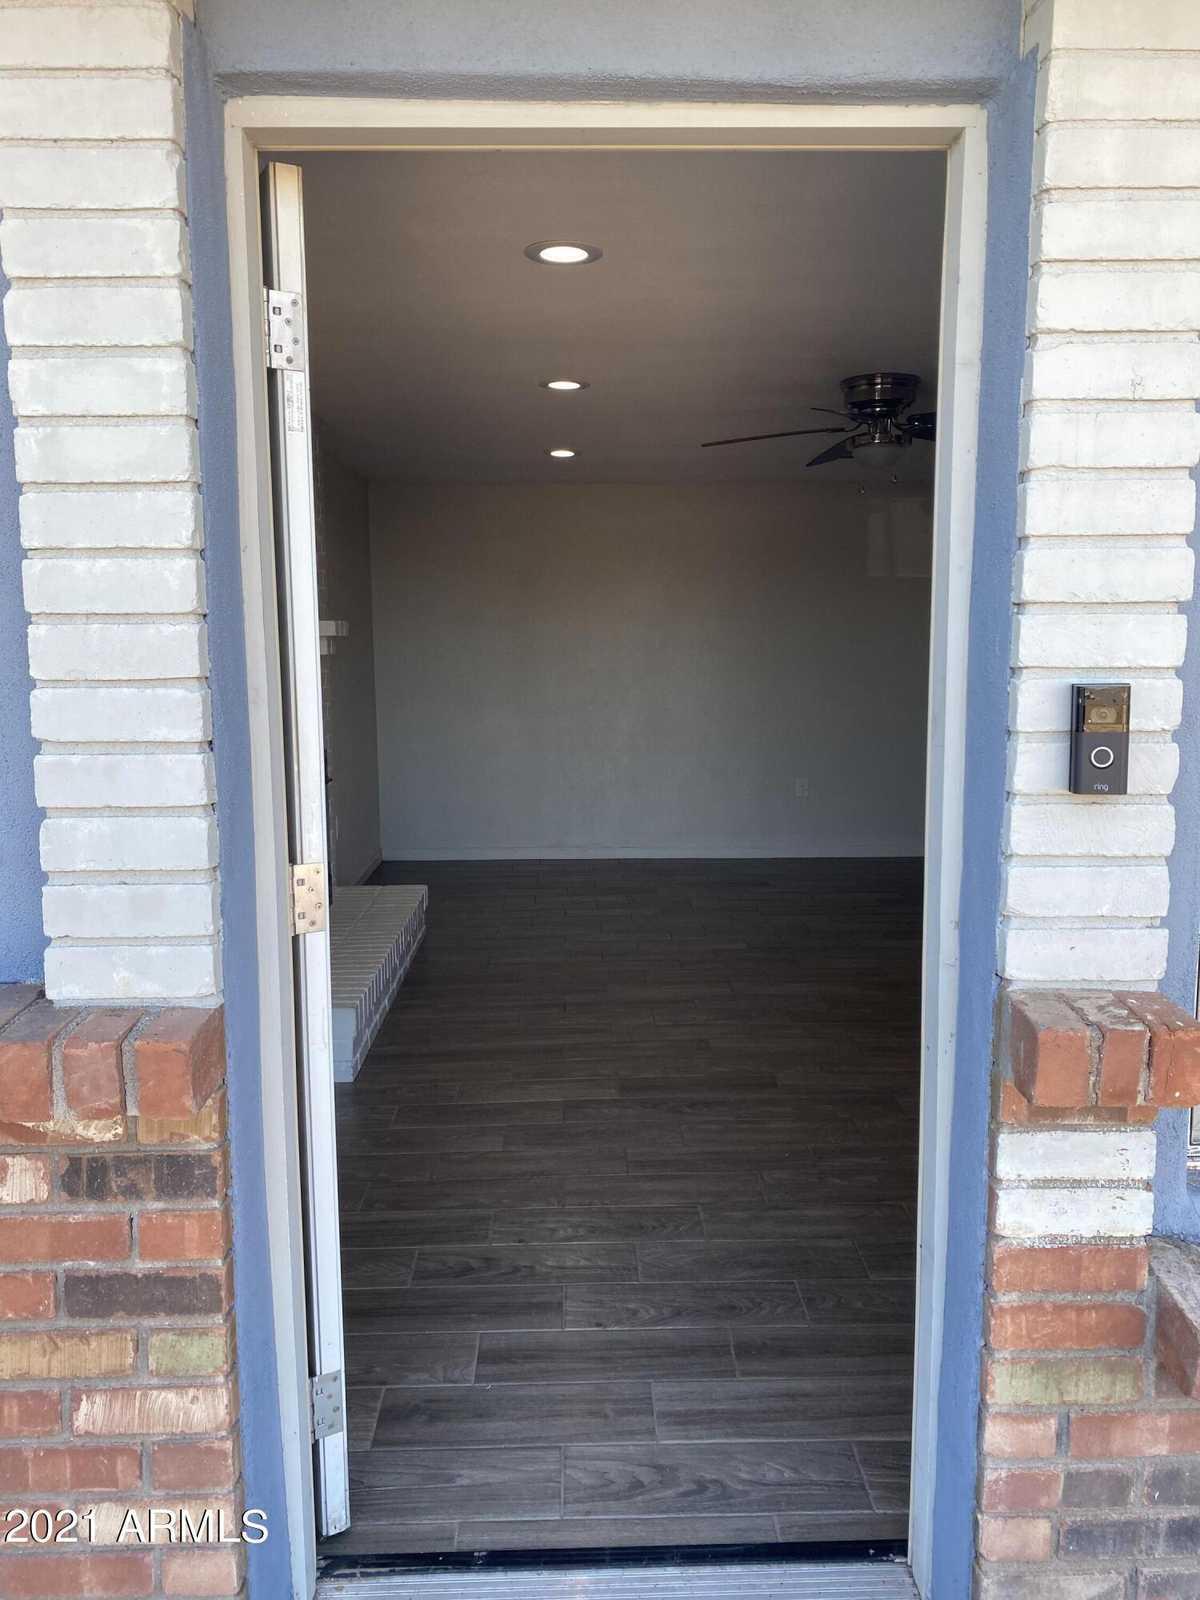 $367,500 - 3Br/2Ba - Home for Sale in North Tempe, Tempe